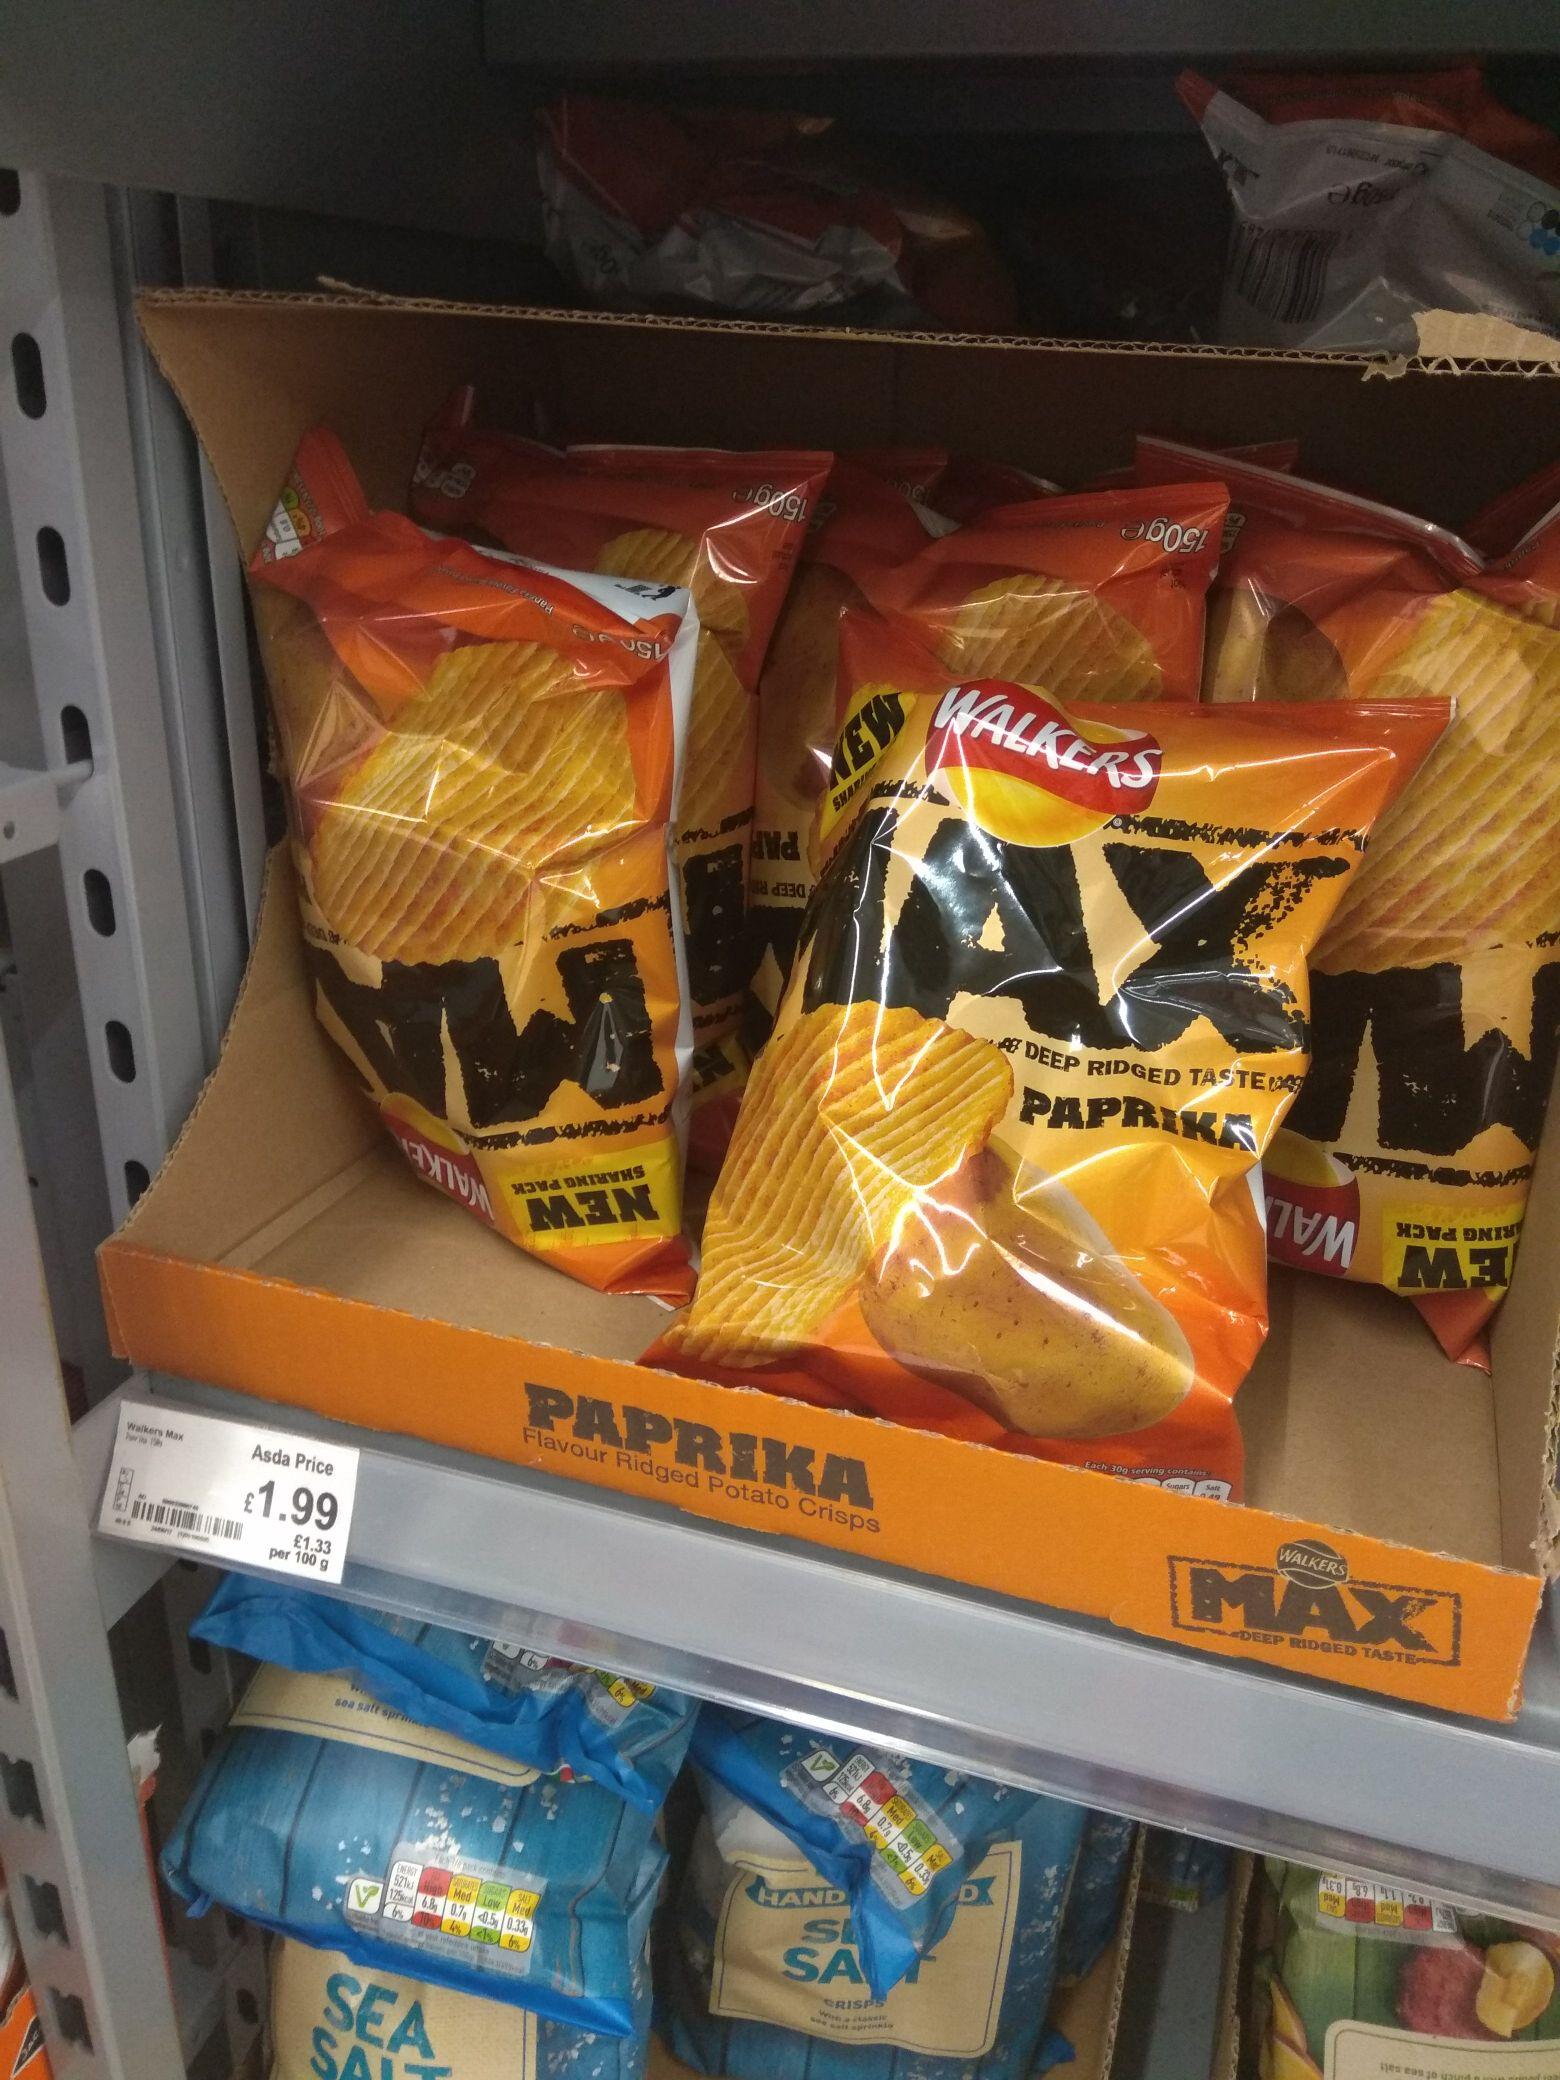 Walkers paprika flavour 150g £1.99 @ asda